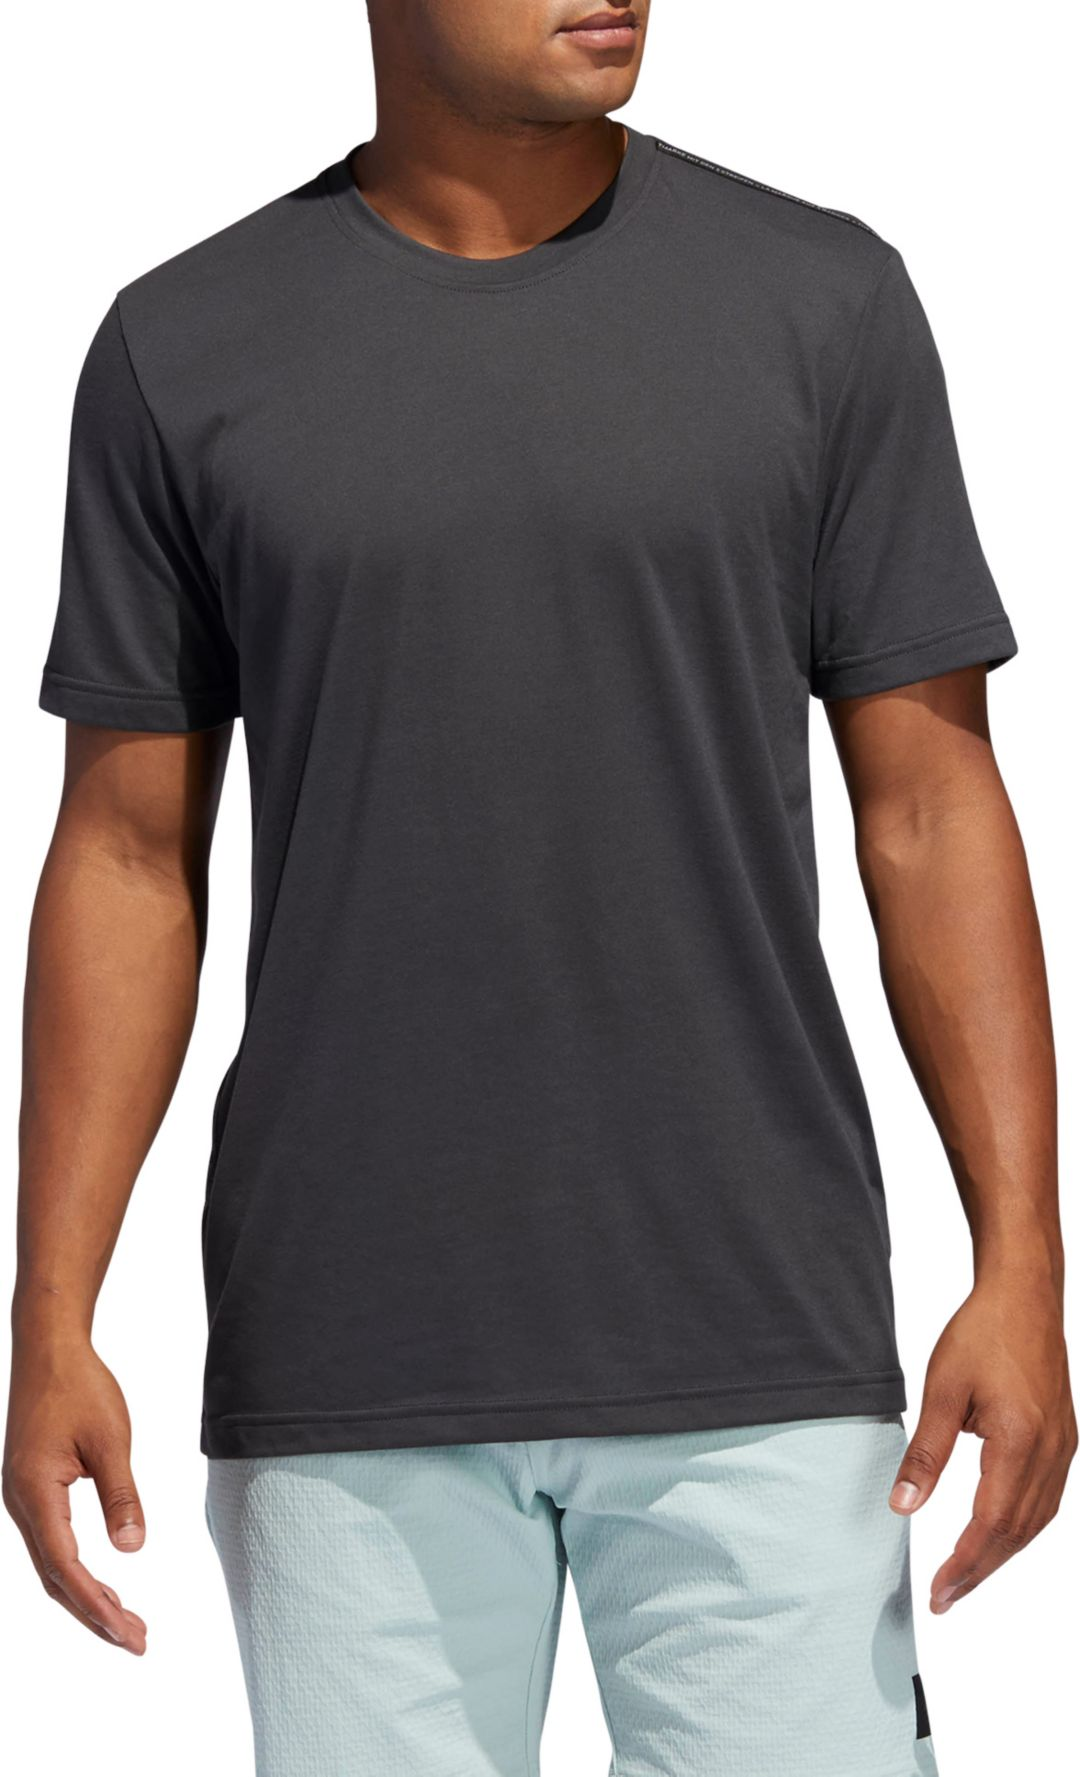 a14aea5f4101d adidas Men's Adicross Big Logo Golf T-Shirt | DICK'S Sporting Goods